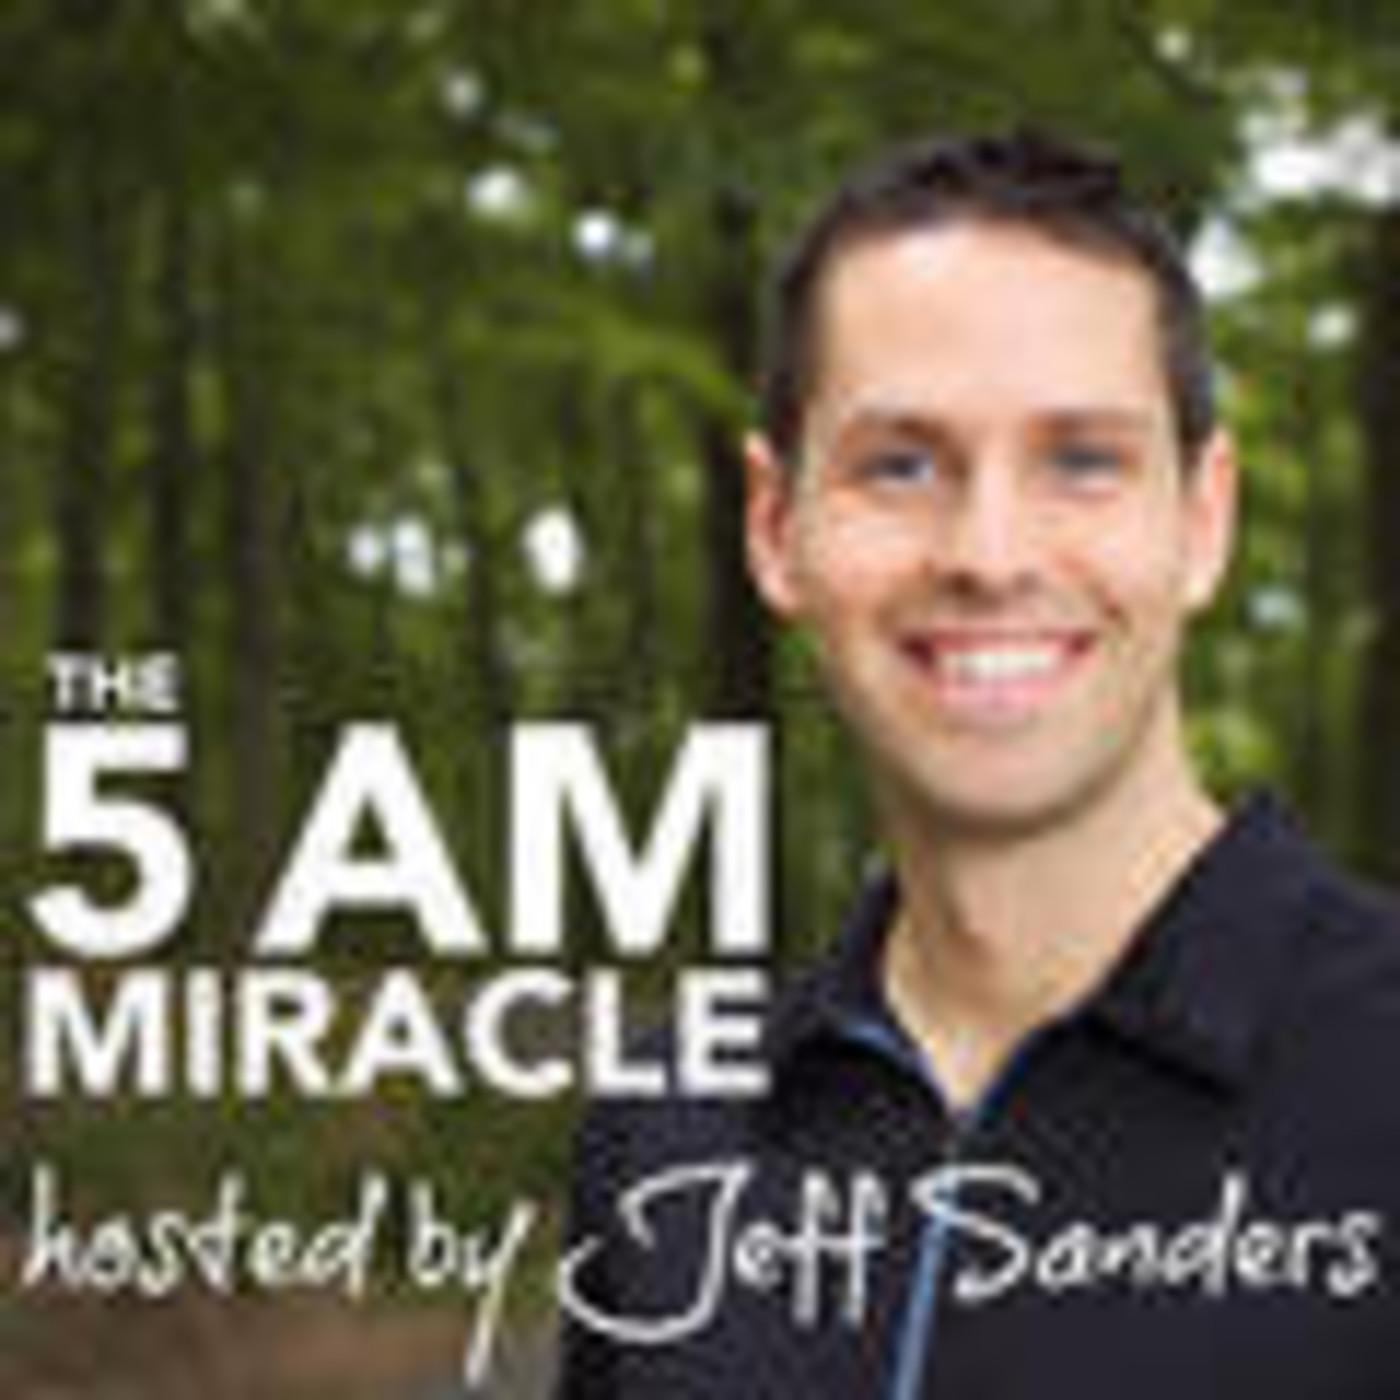 Jeff Sanders: Productivity Coa